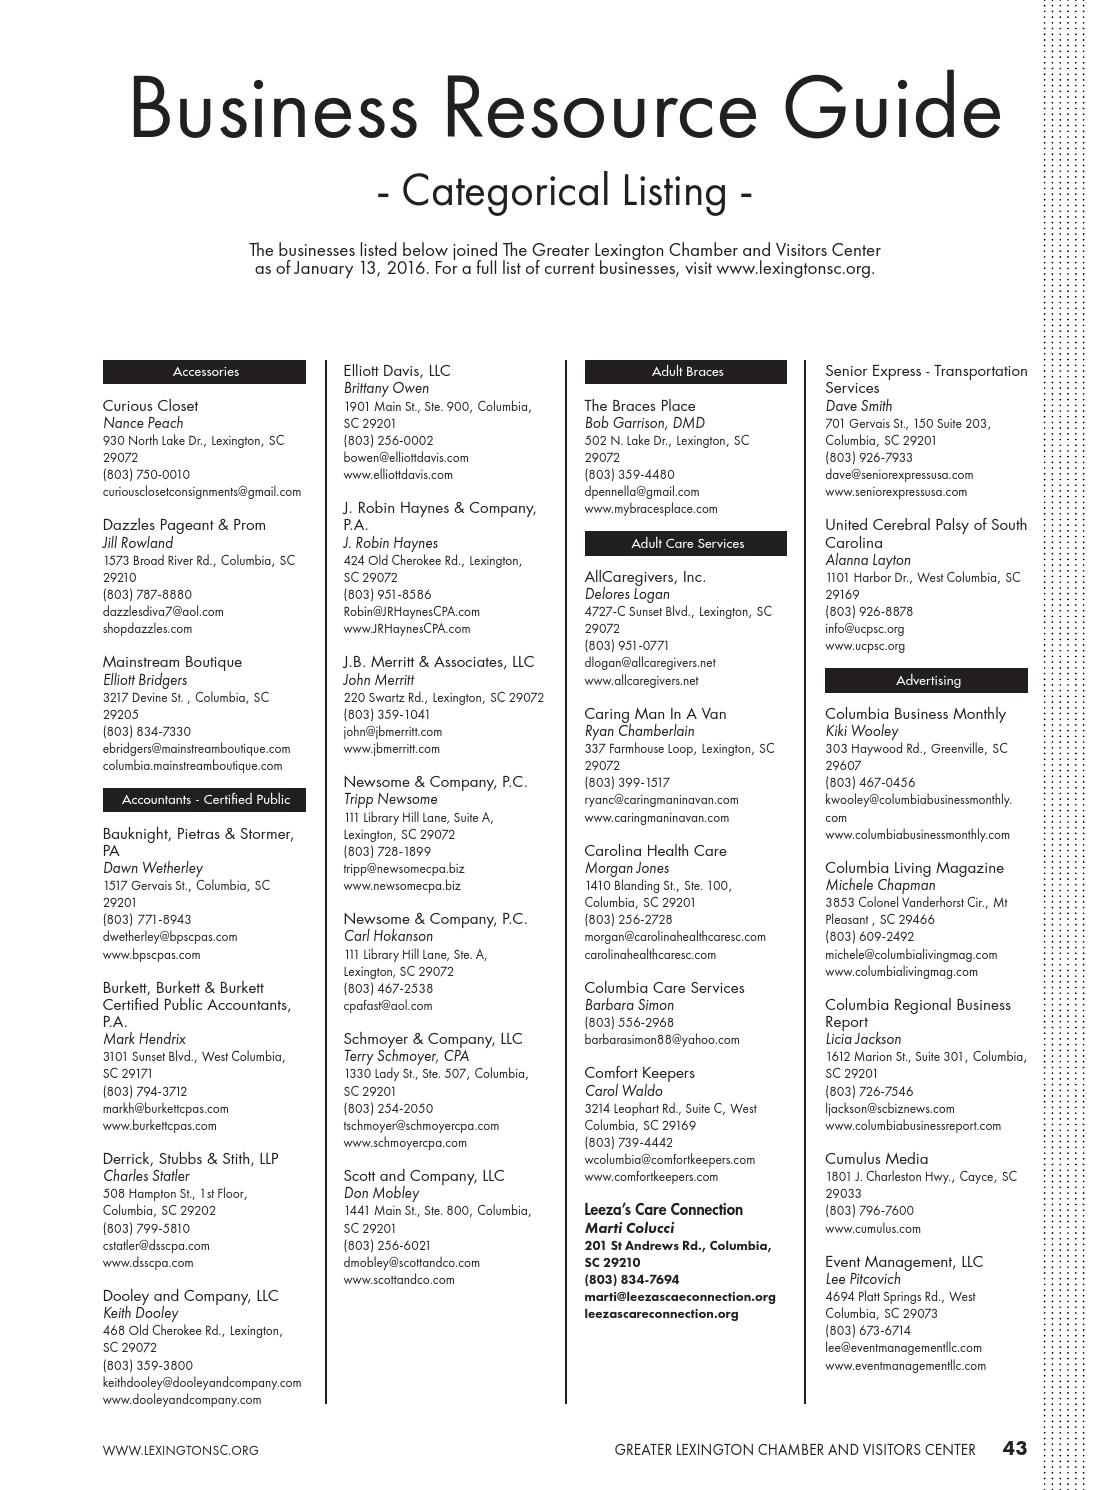 2016 Lexington, SC Community & Business Resource Guide by